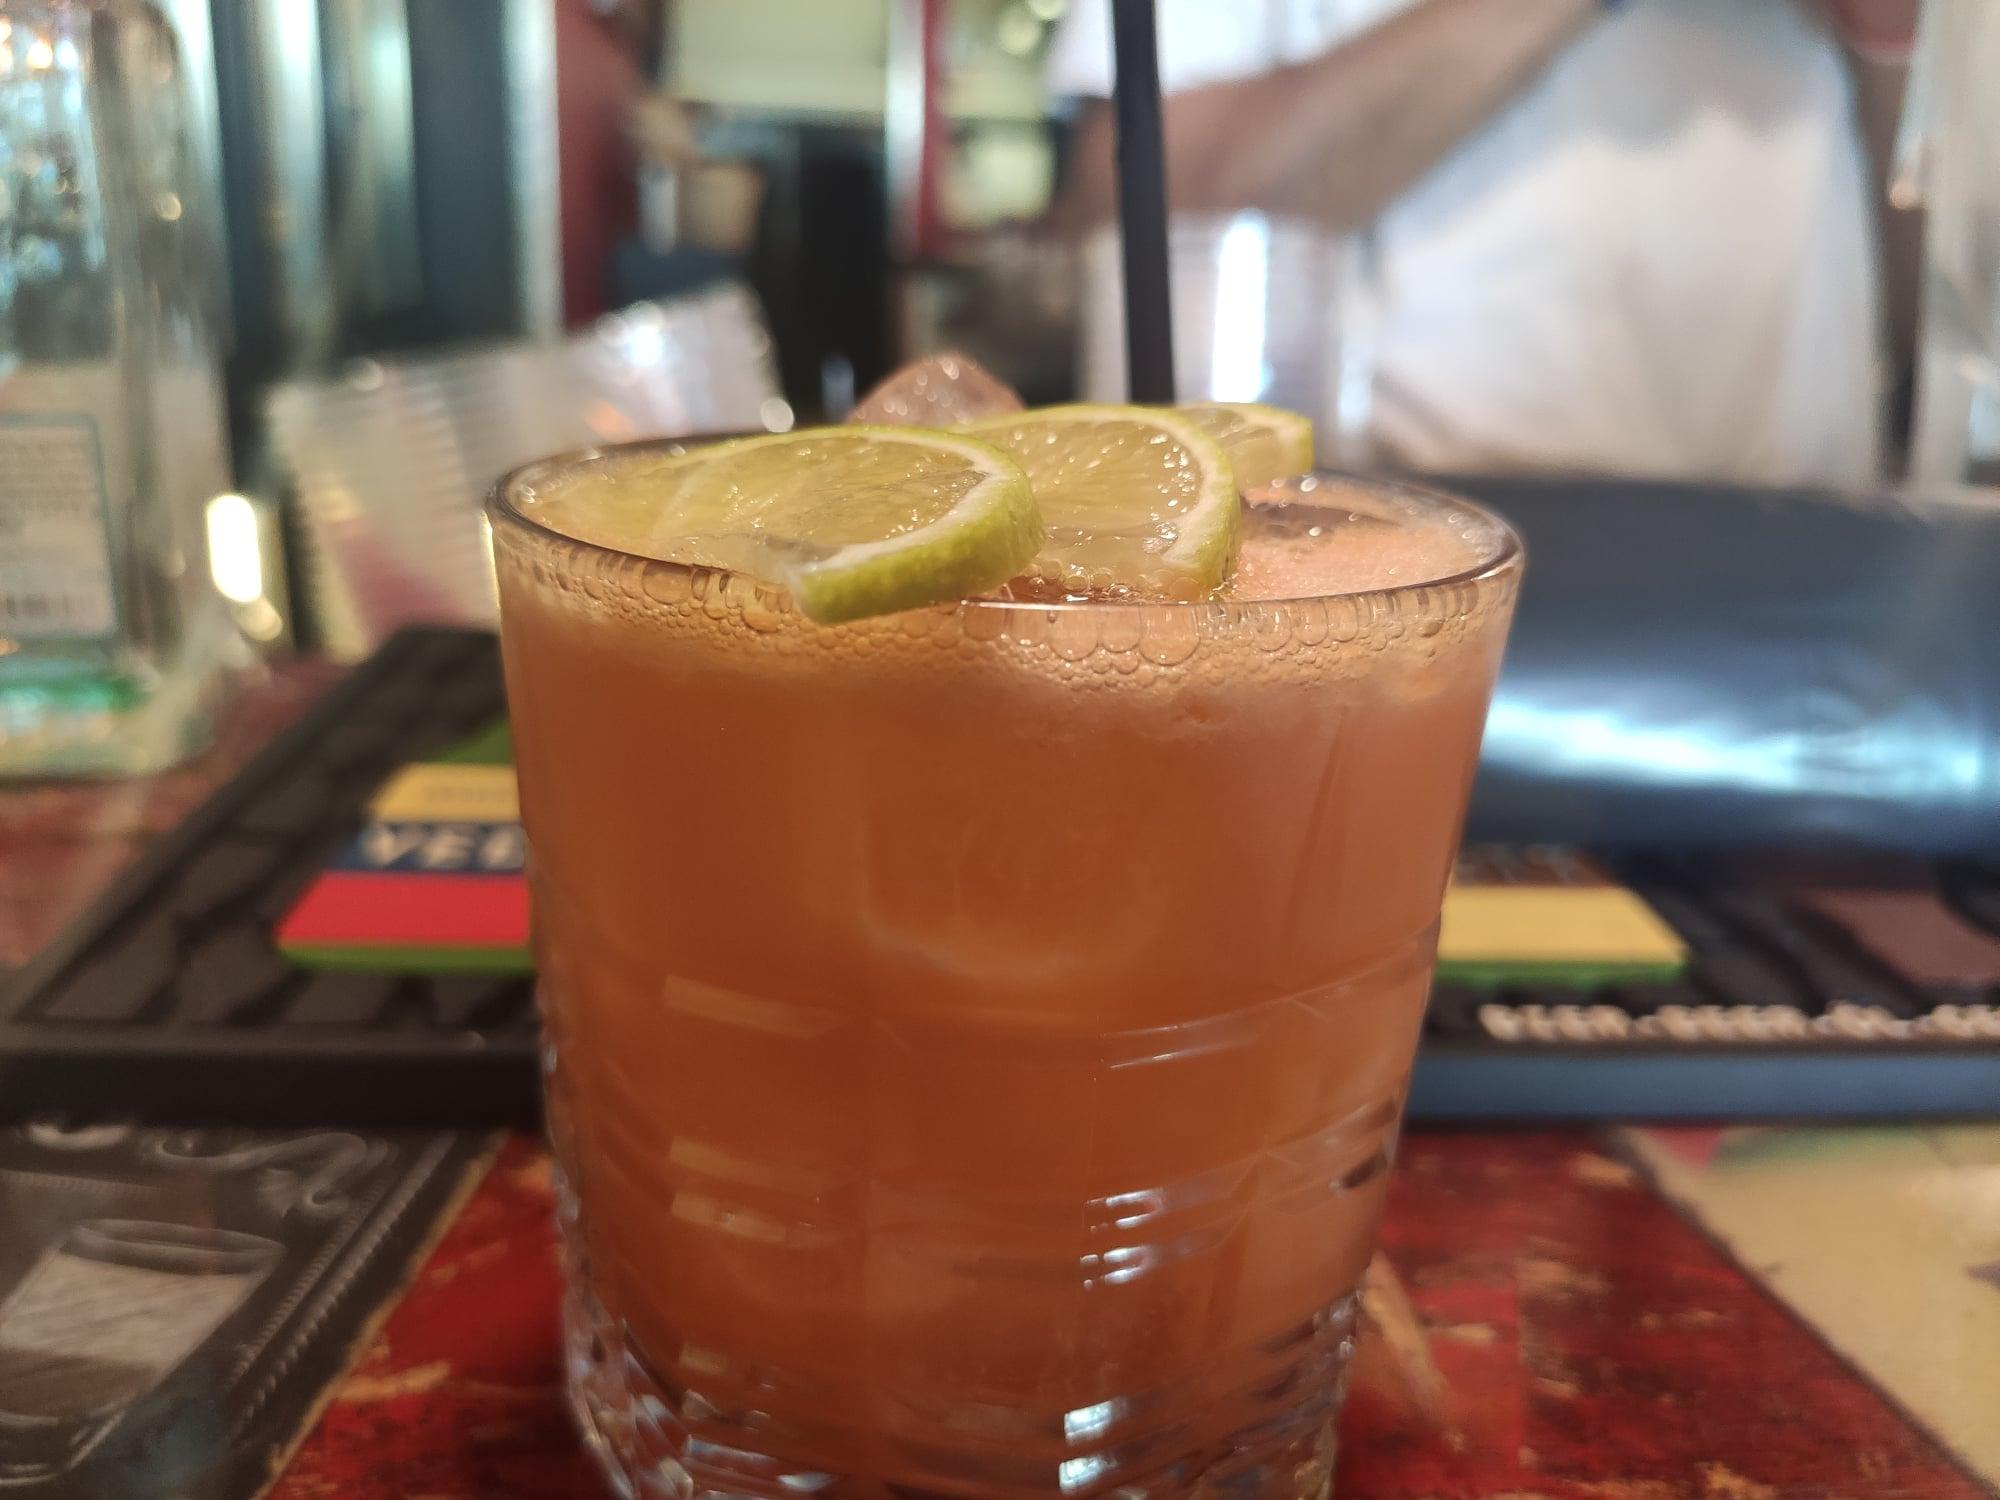 Bar La Bodega - Les Sables d'Olonne - Mai Tai